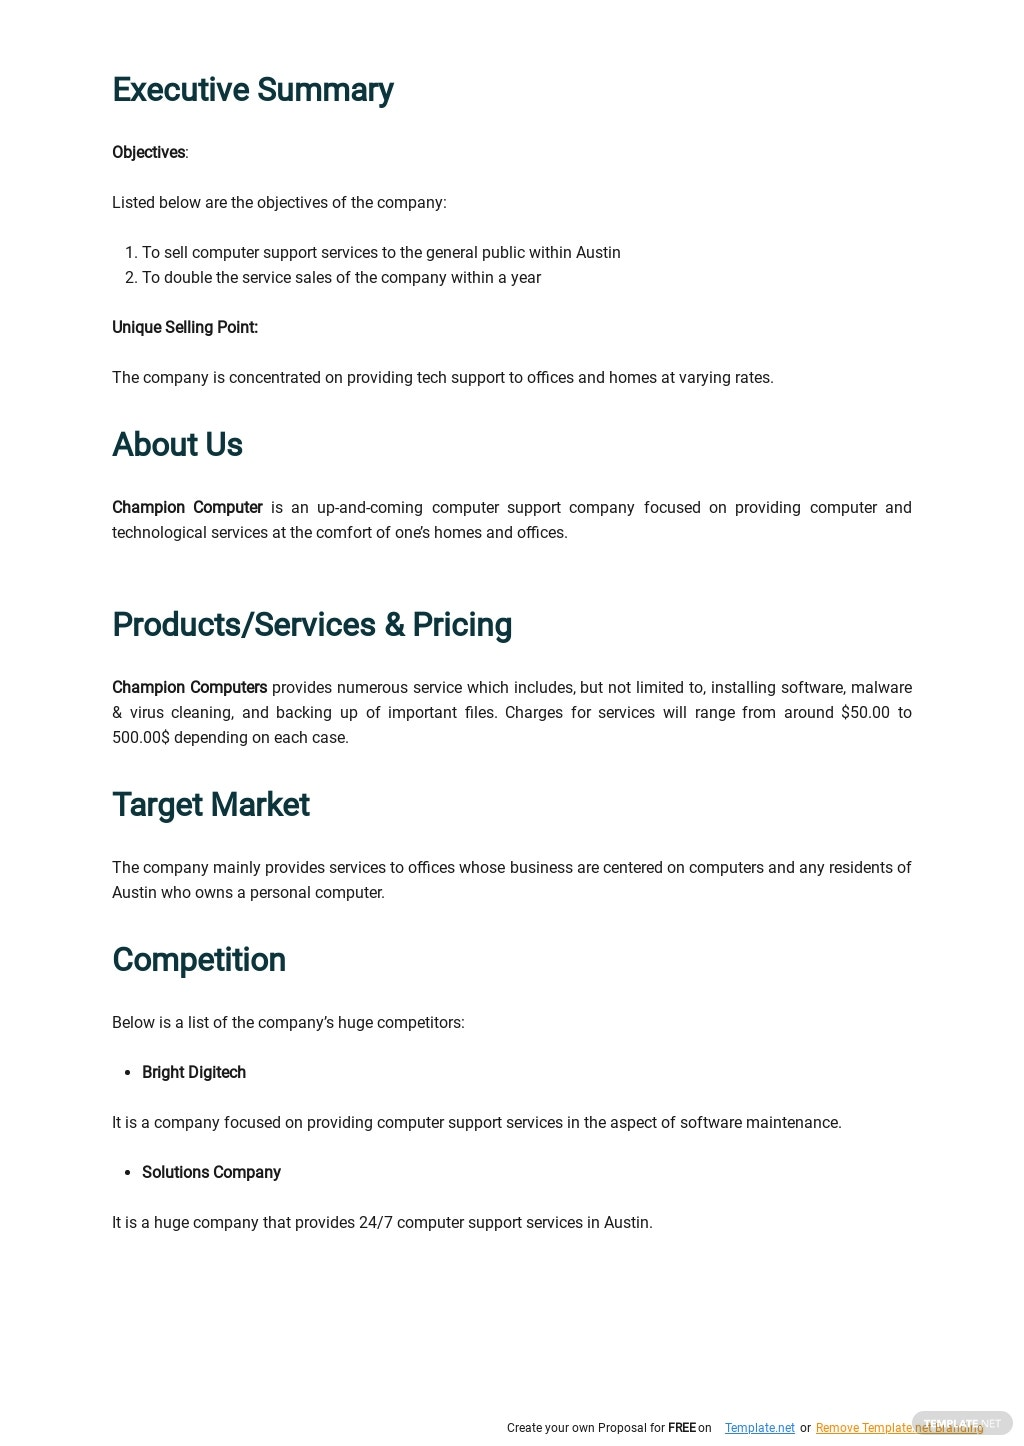 Computer Support Business Plan Template 1.jpe